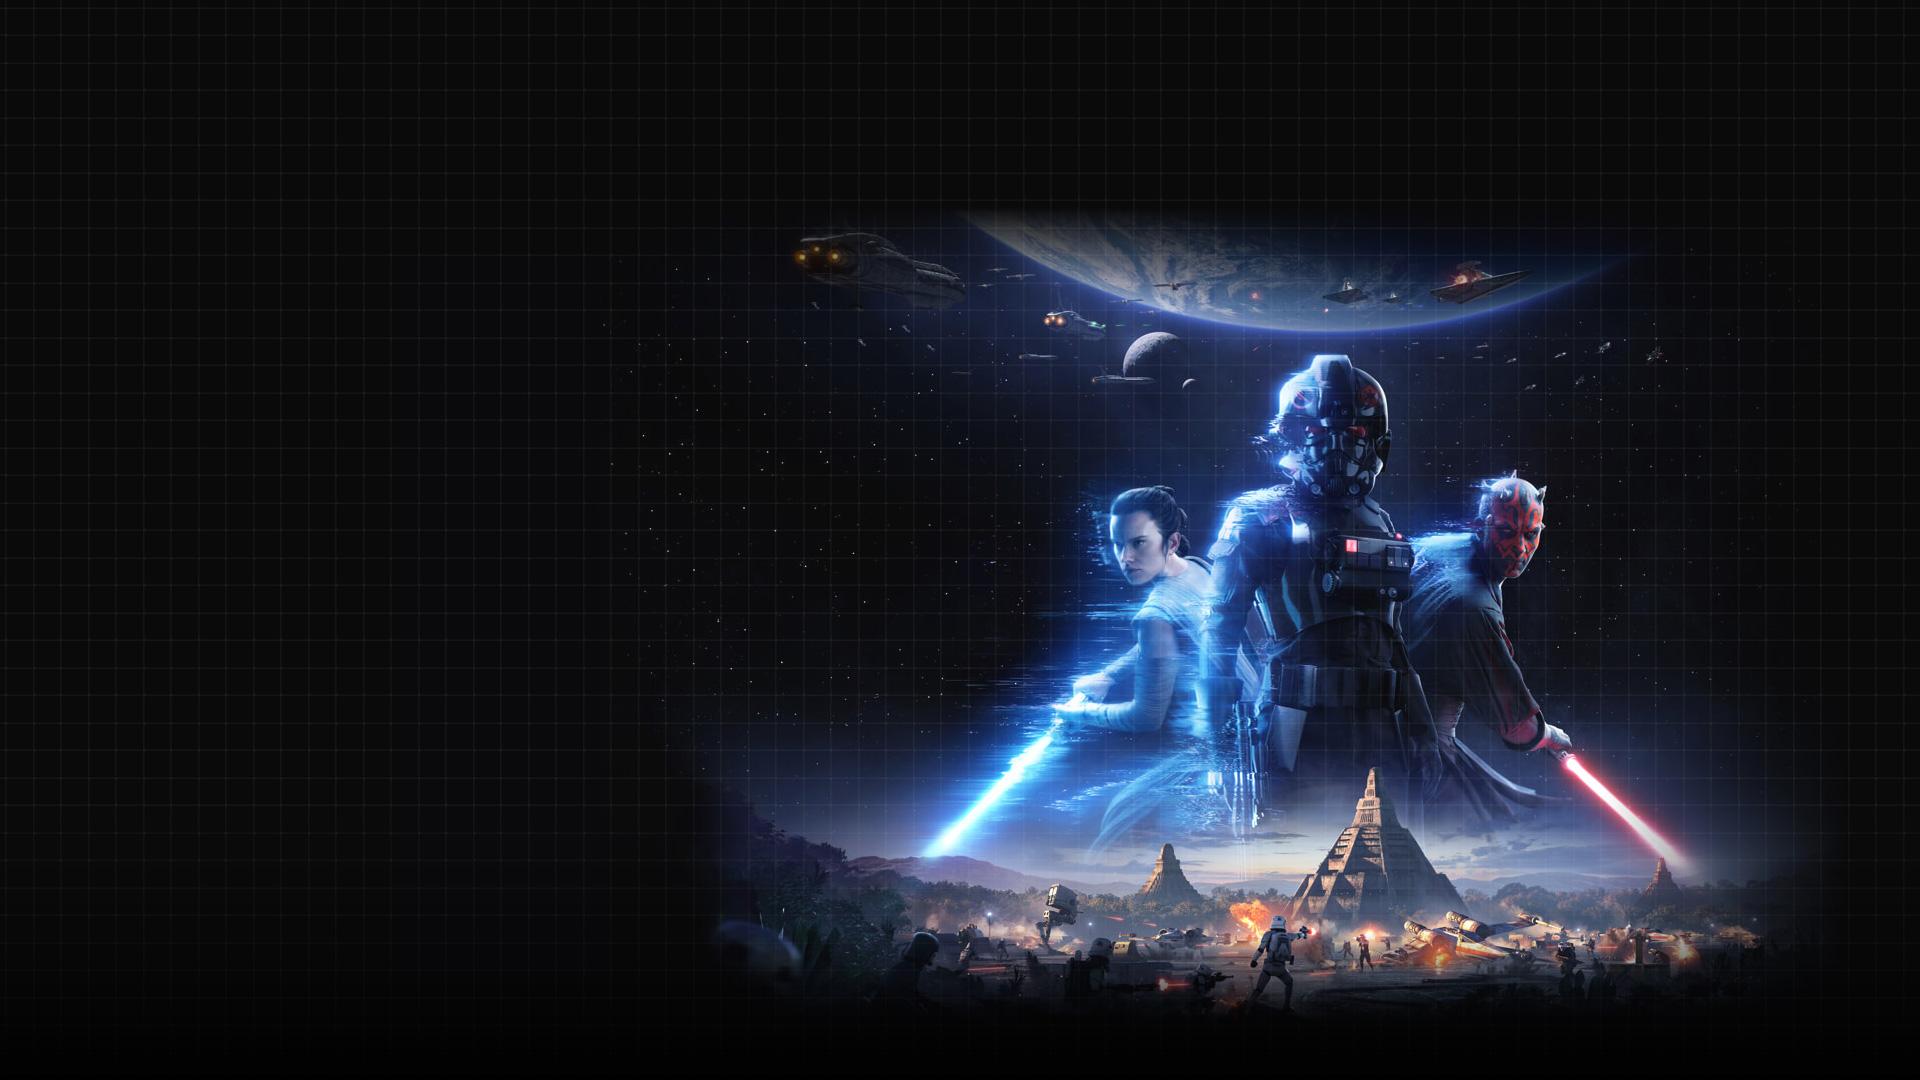 Star Wars Battlefront 2 Playstation Wallpapers